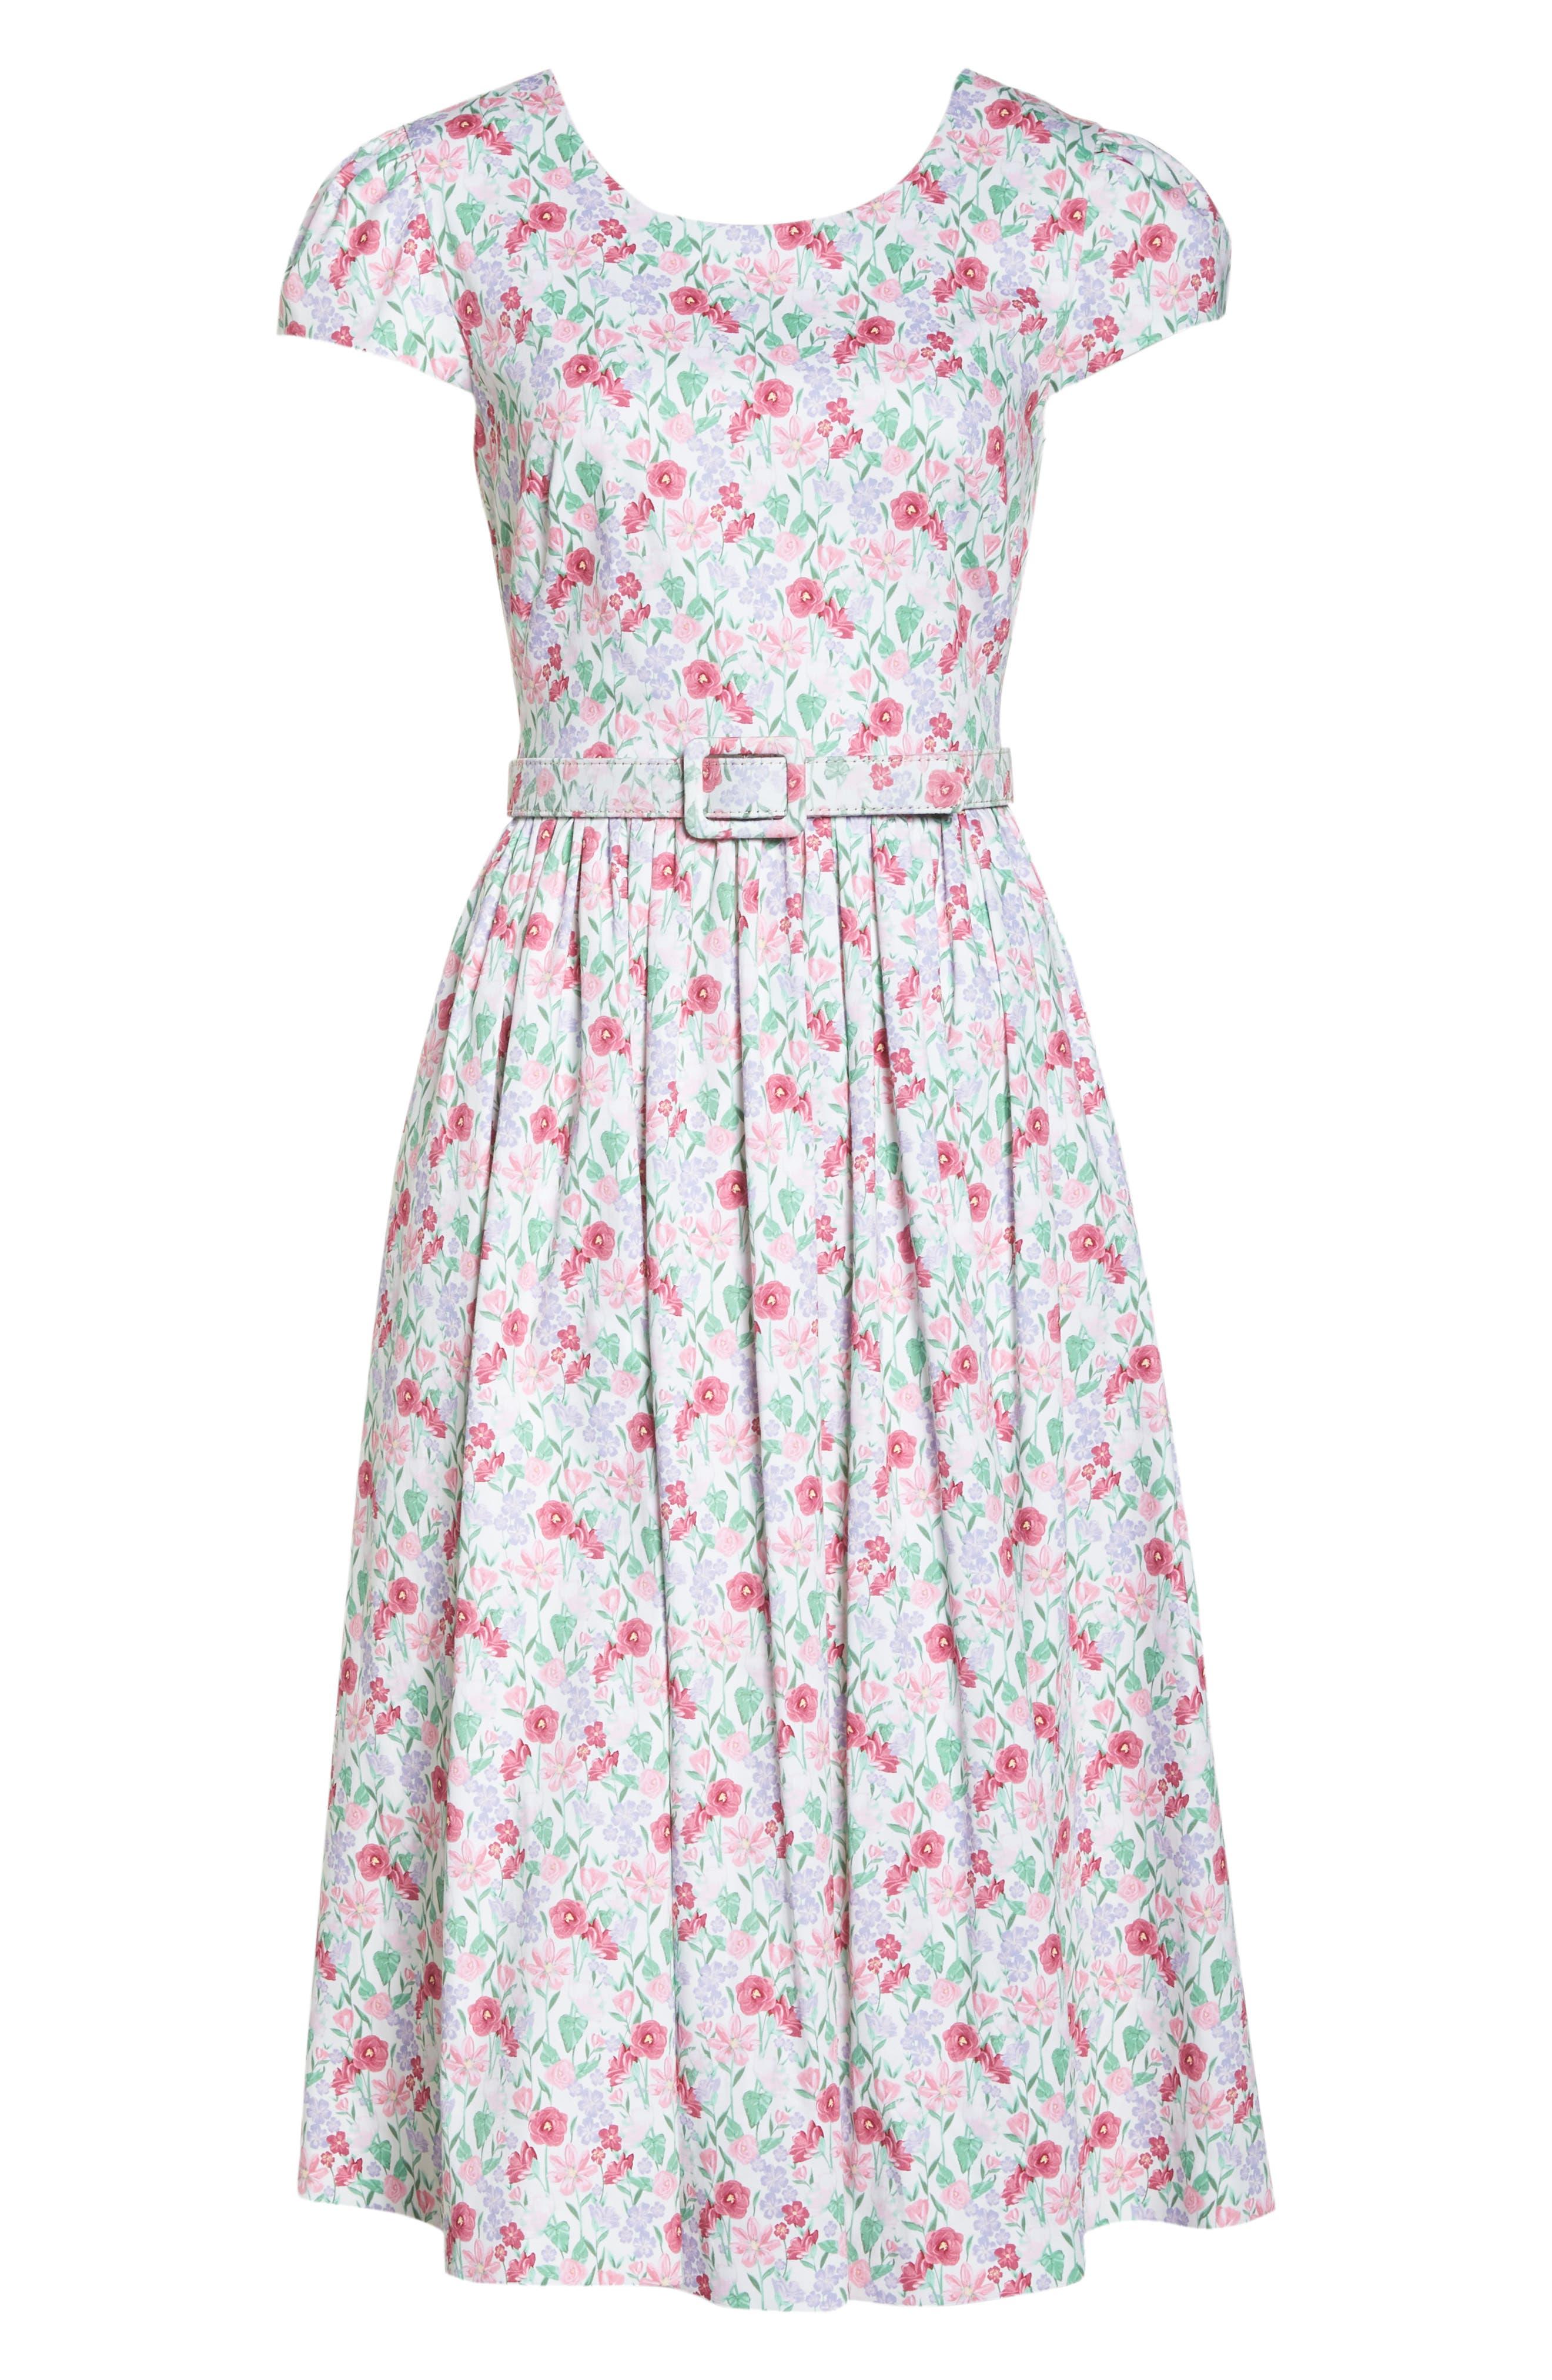 Packed Bouquet Print Stretch Cotton Dress,                             Alternate thumbnail 7, color,                             650